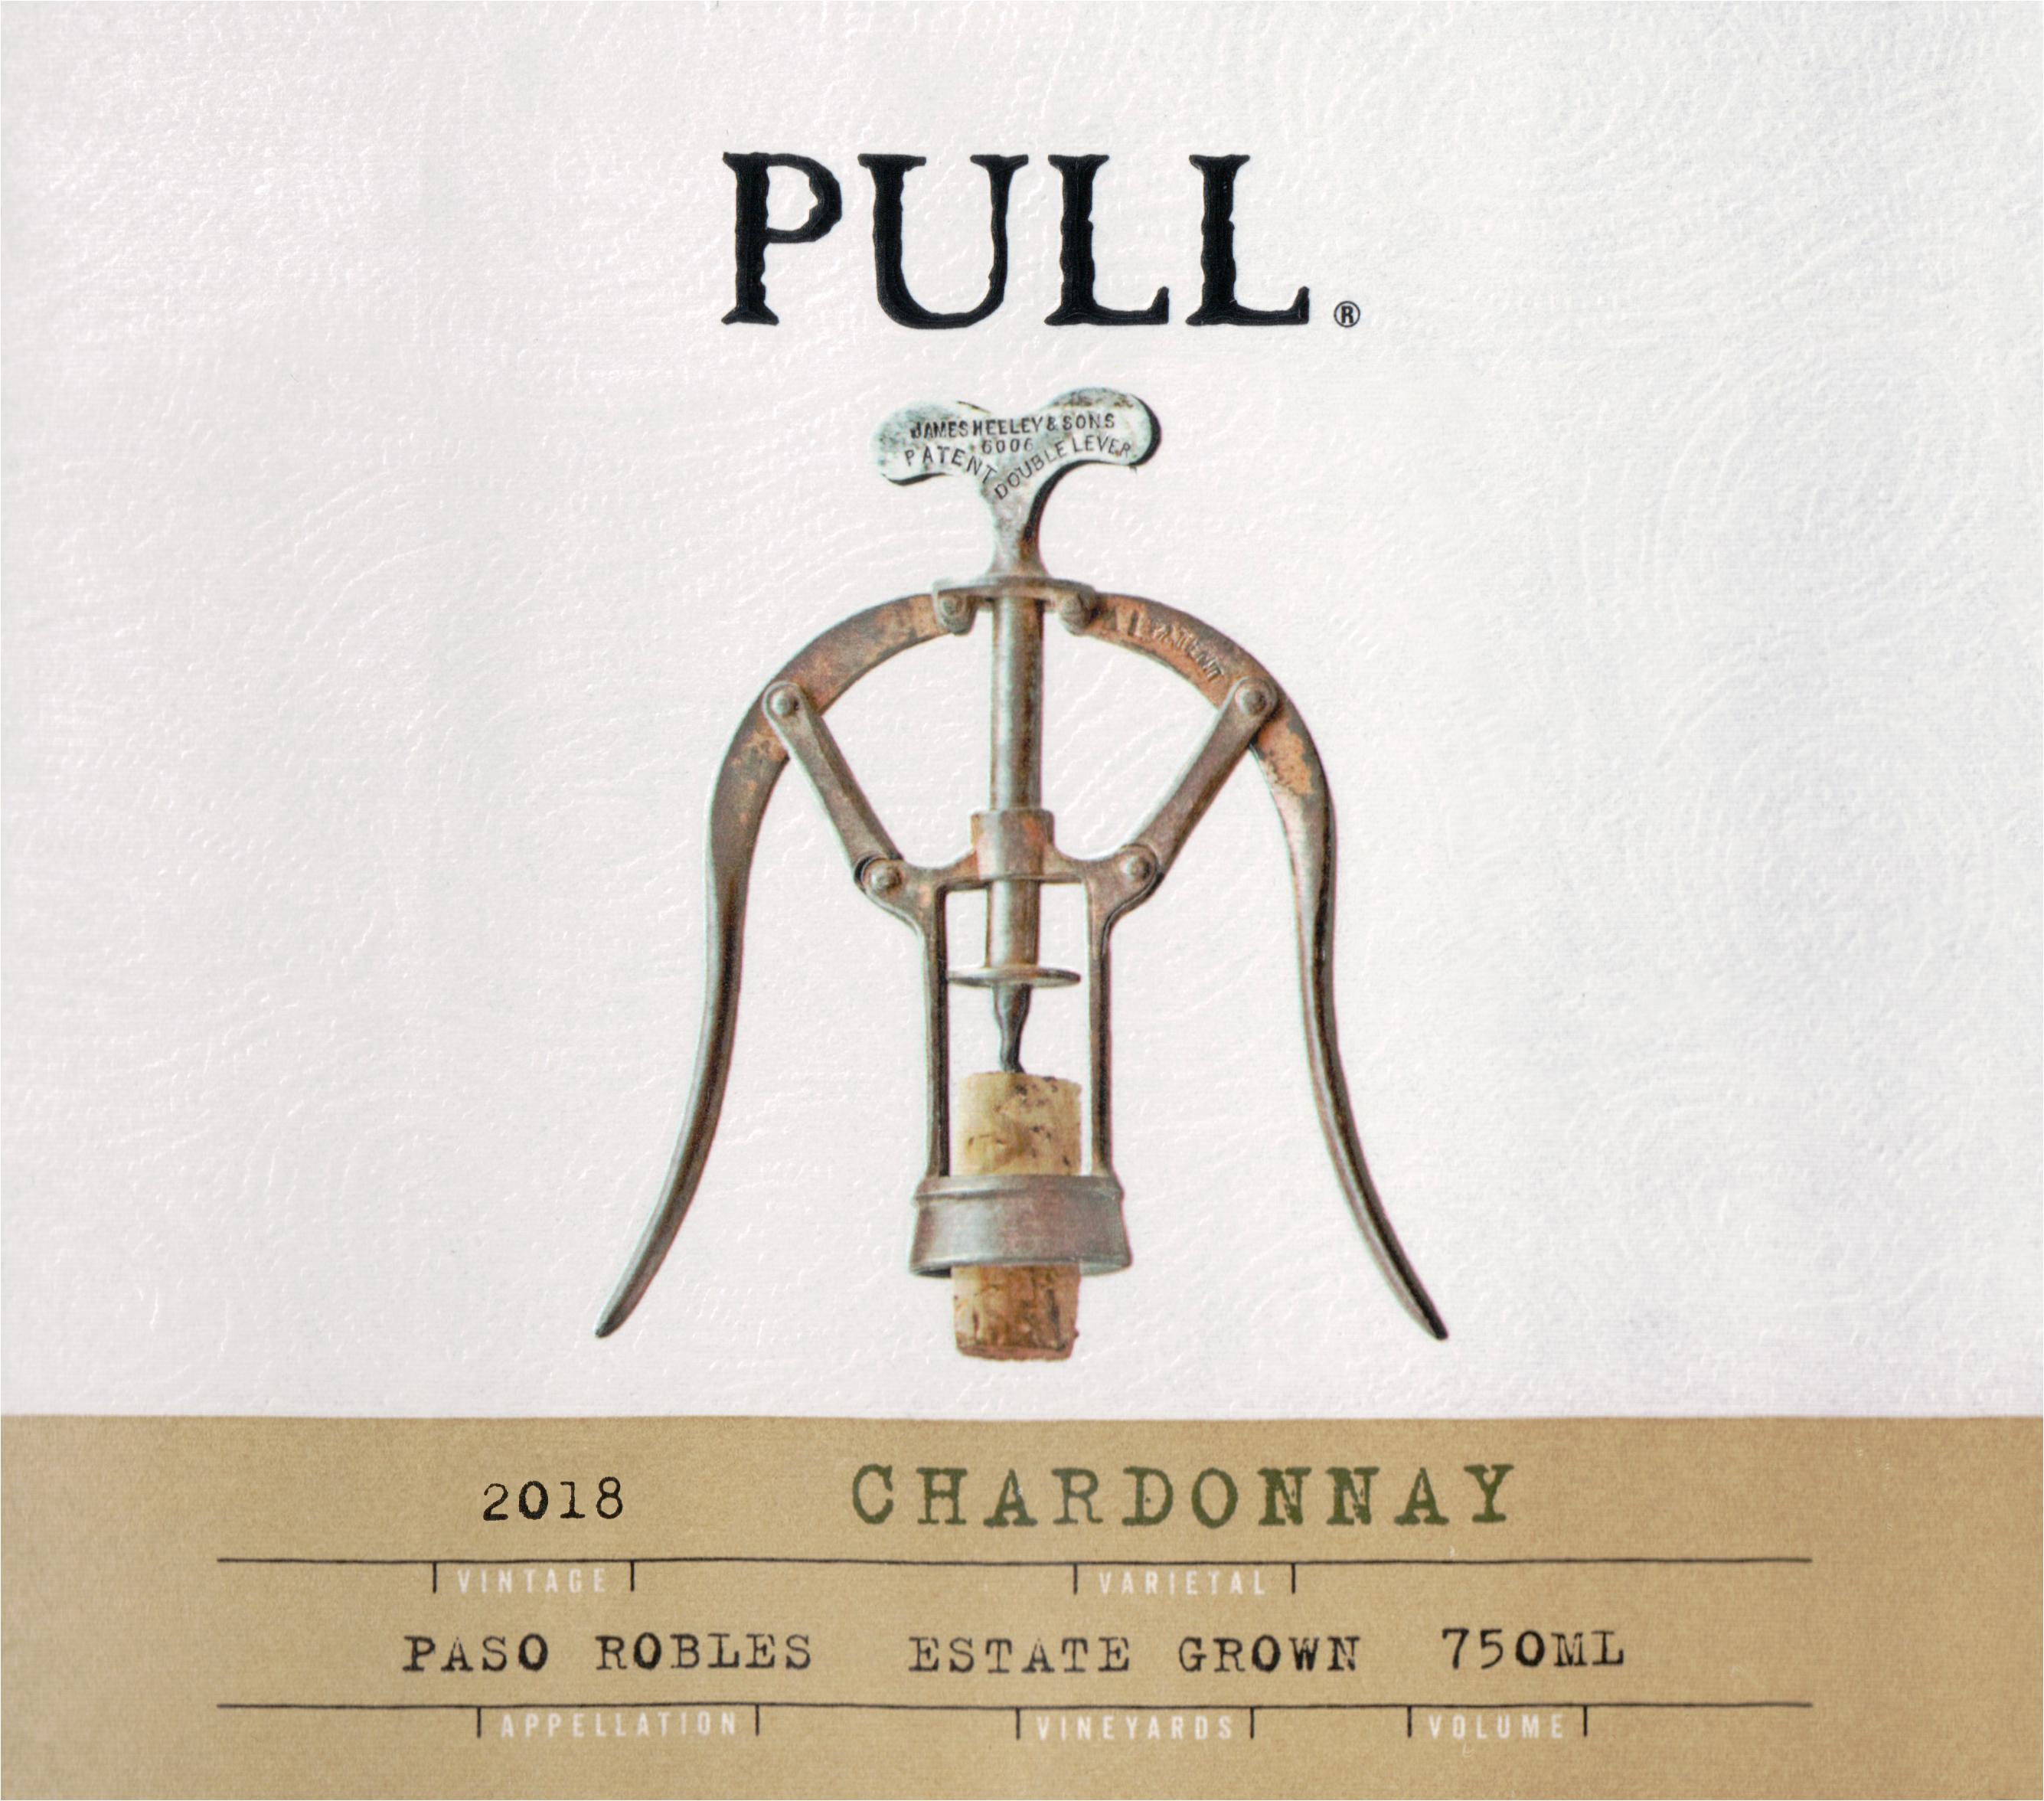 Pull Chardonnay 2018